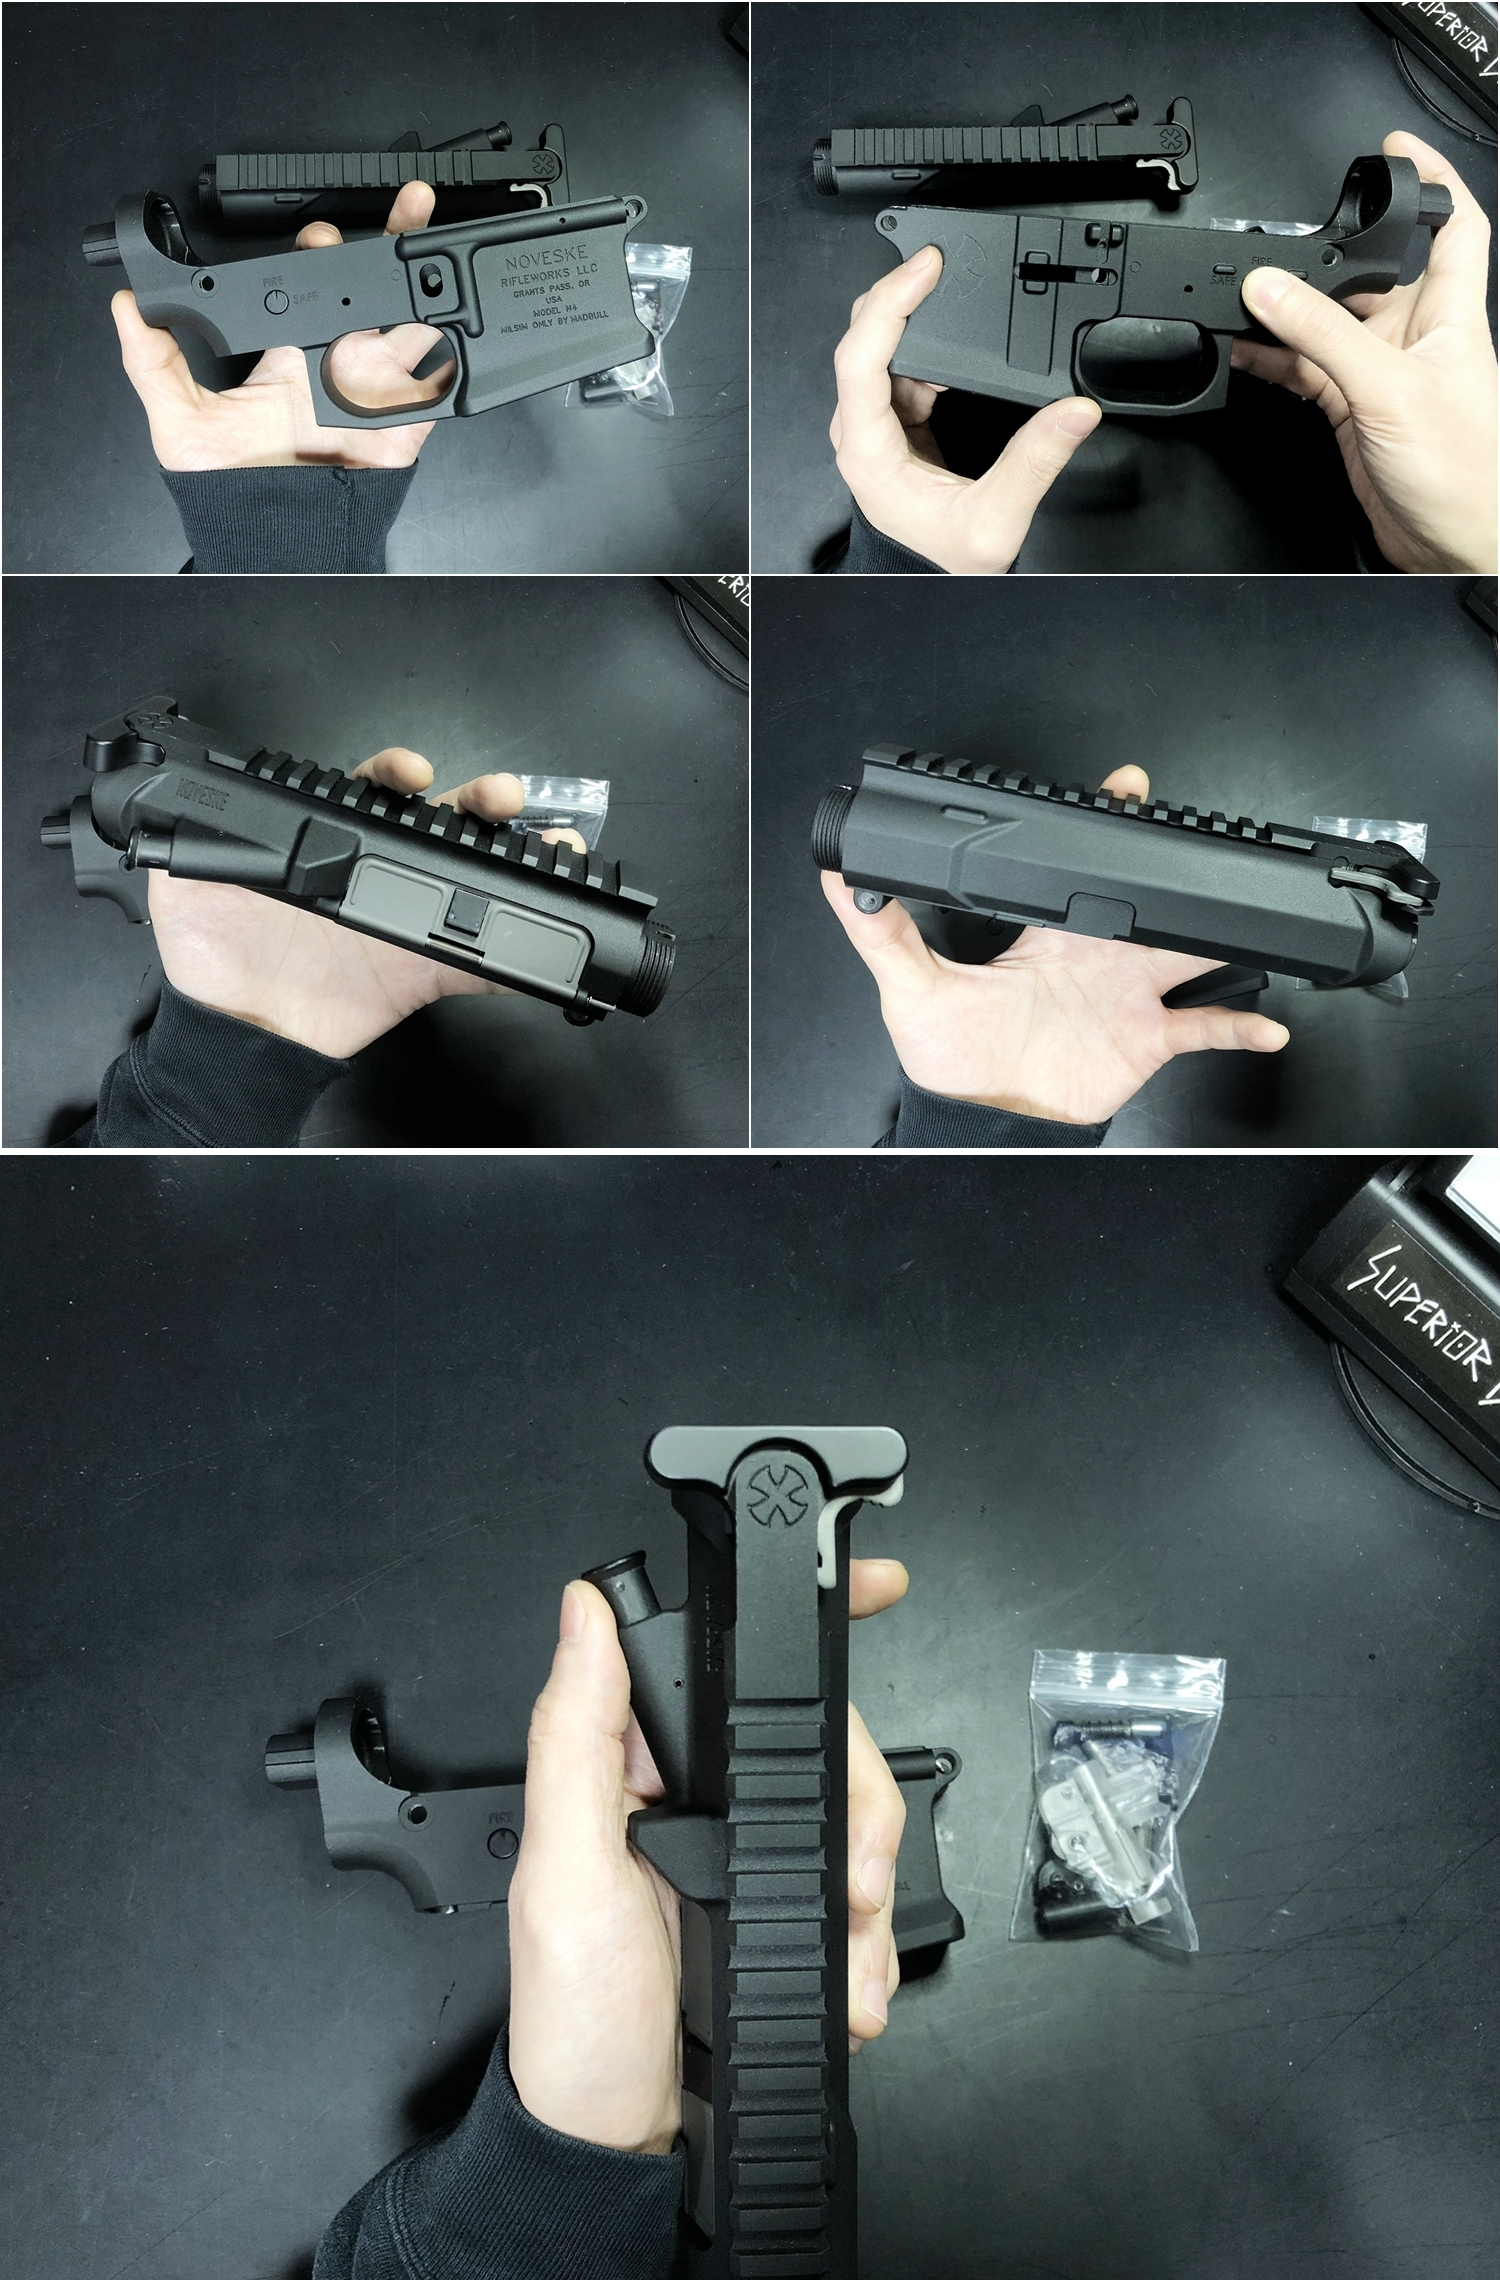 2 NOVESKE GEN3 N4 BY MADBULL!! 『第一弾』 新たにSTD民間系ARを作り始めたいと思います!! STD AR-15 M4 スタンダード 電動ガン マルイ ノベスケ ノベスキー マットブル メタルフレーム 動作テスト 組込 取付 カス